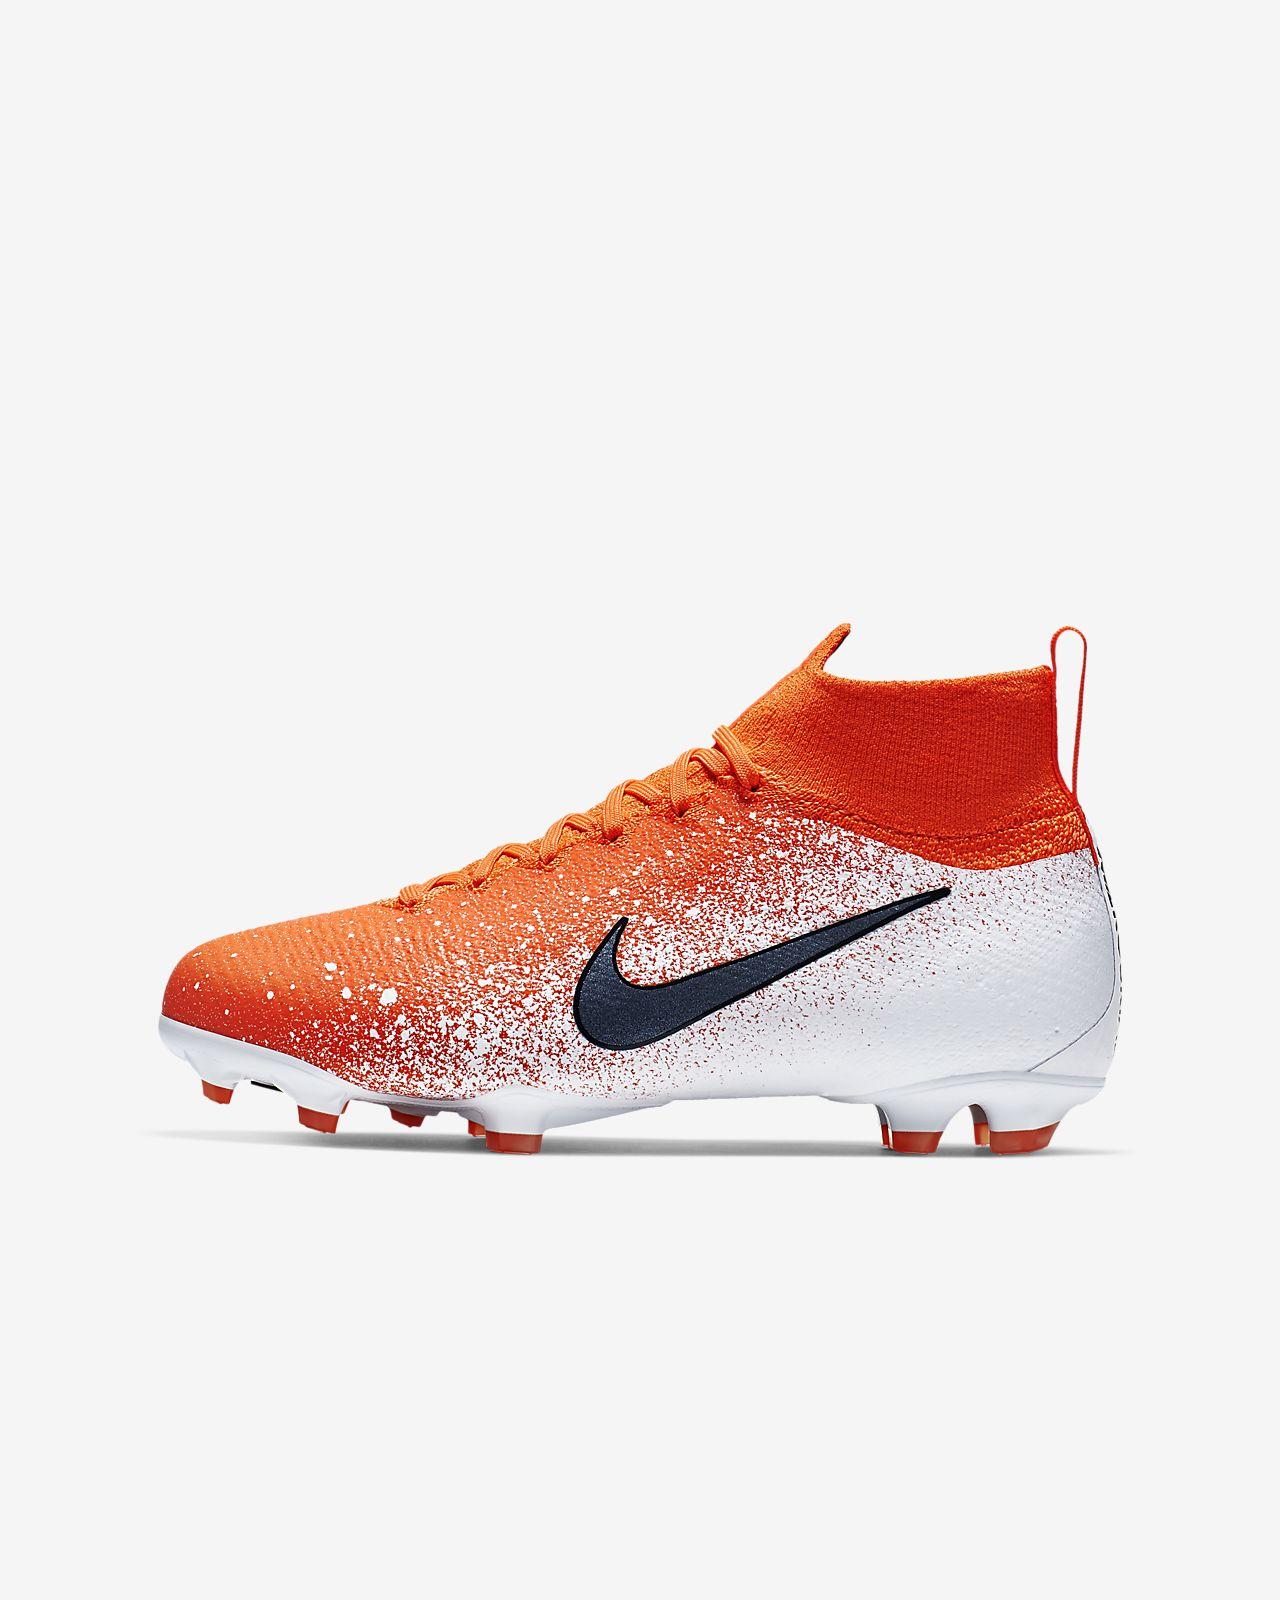 Chuteiras de futebol para terreno firme Nike Jr. Superfly 6 Elite FG Júnior